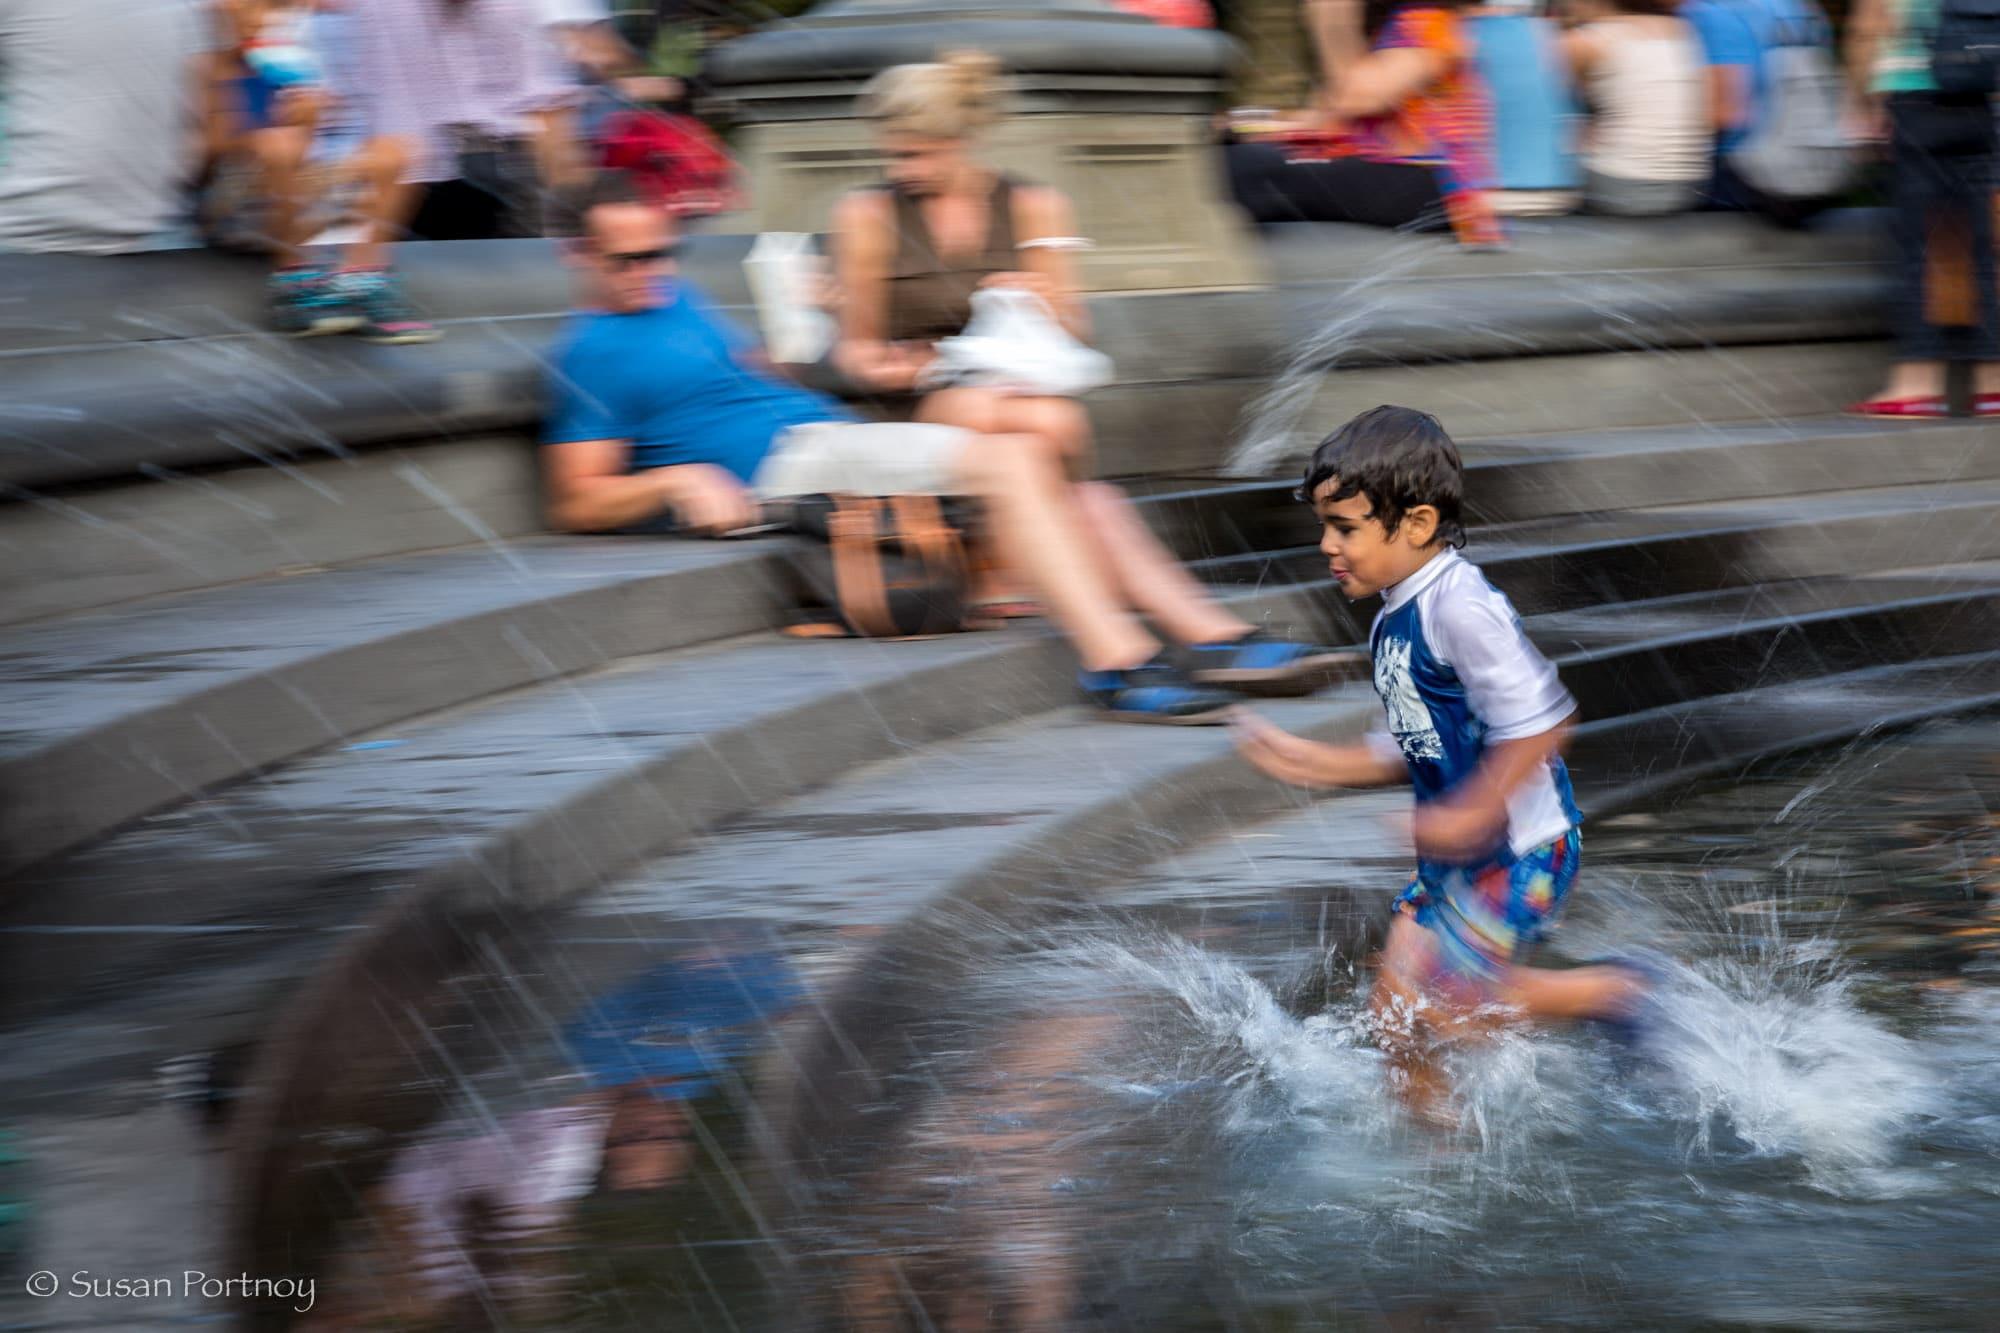 Little boy runs into the fountain in Washington Square Park, NYC